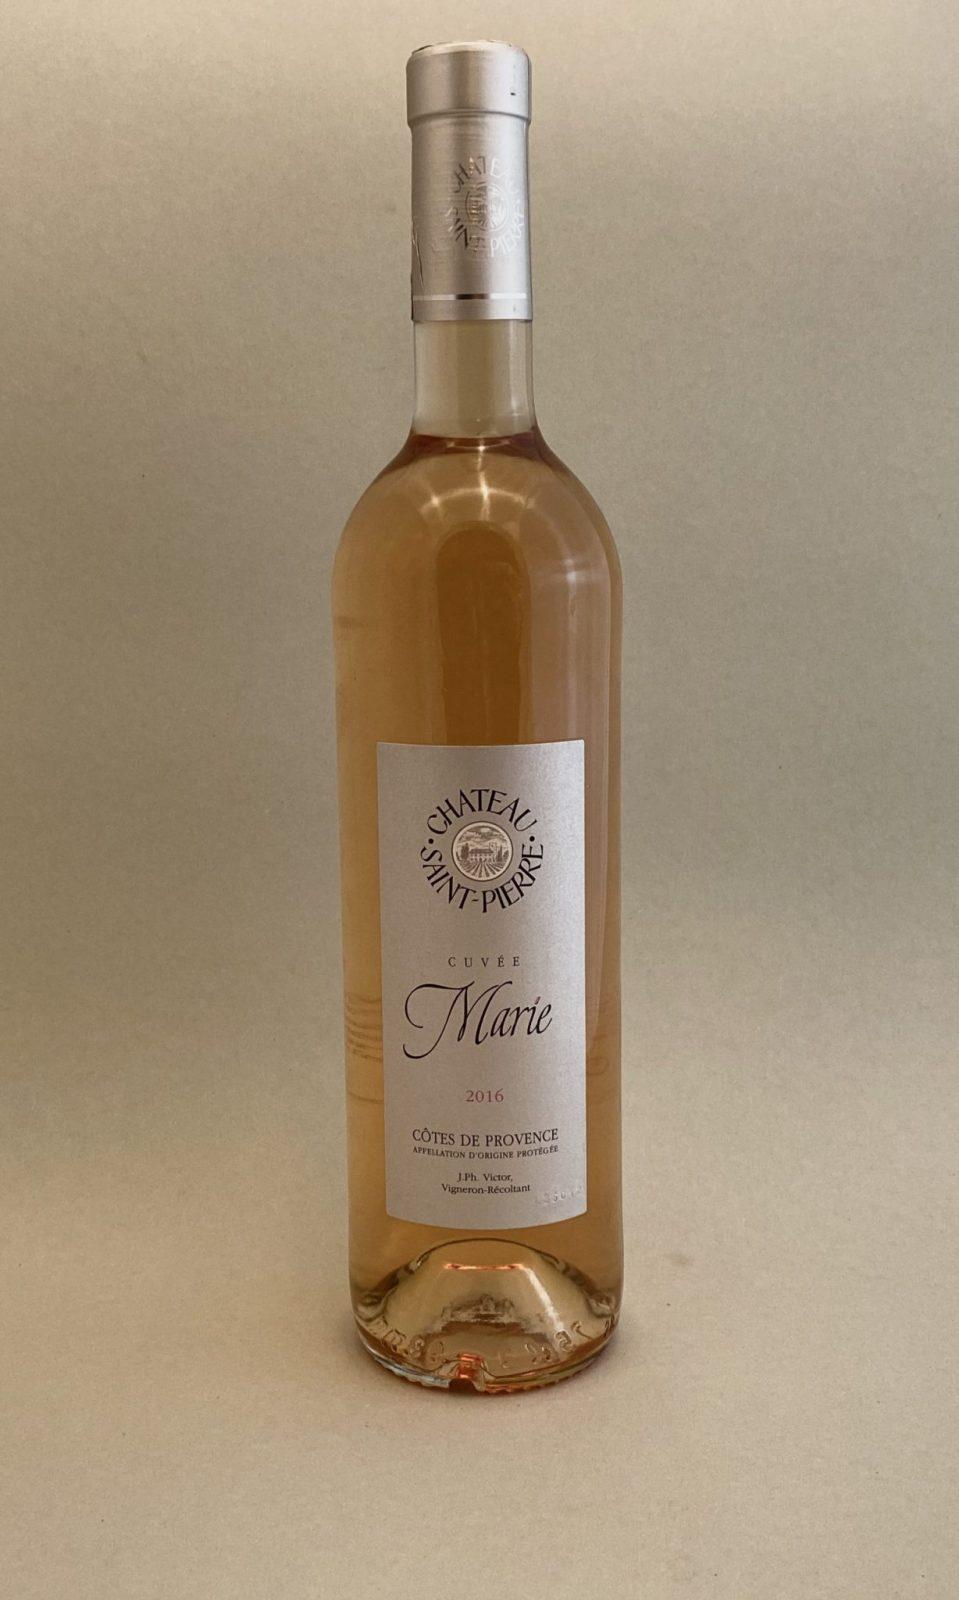 Chahteau SAINT PIERRE Cuveé Marie 2016, vinoteka Bratislava Sunny wines slnecnice mesto, petrzalka, vino ružové z Francúzska